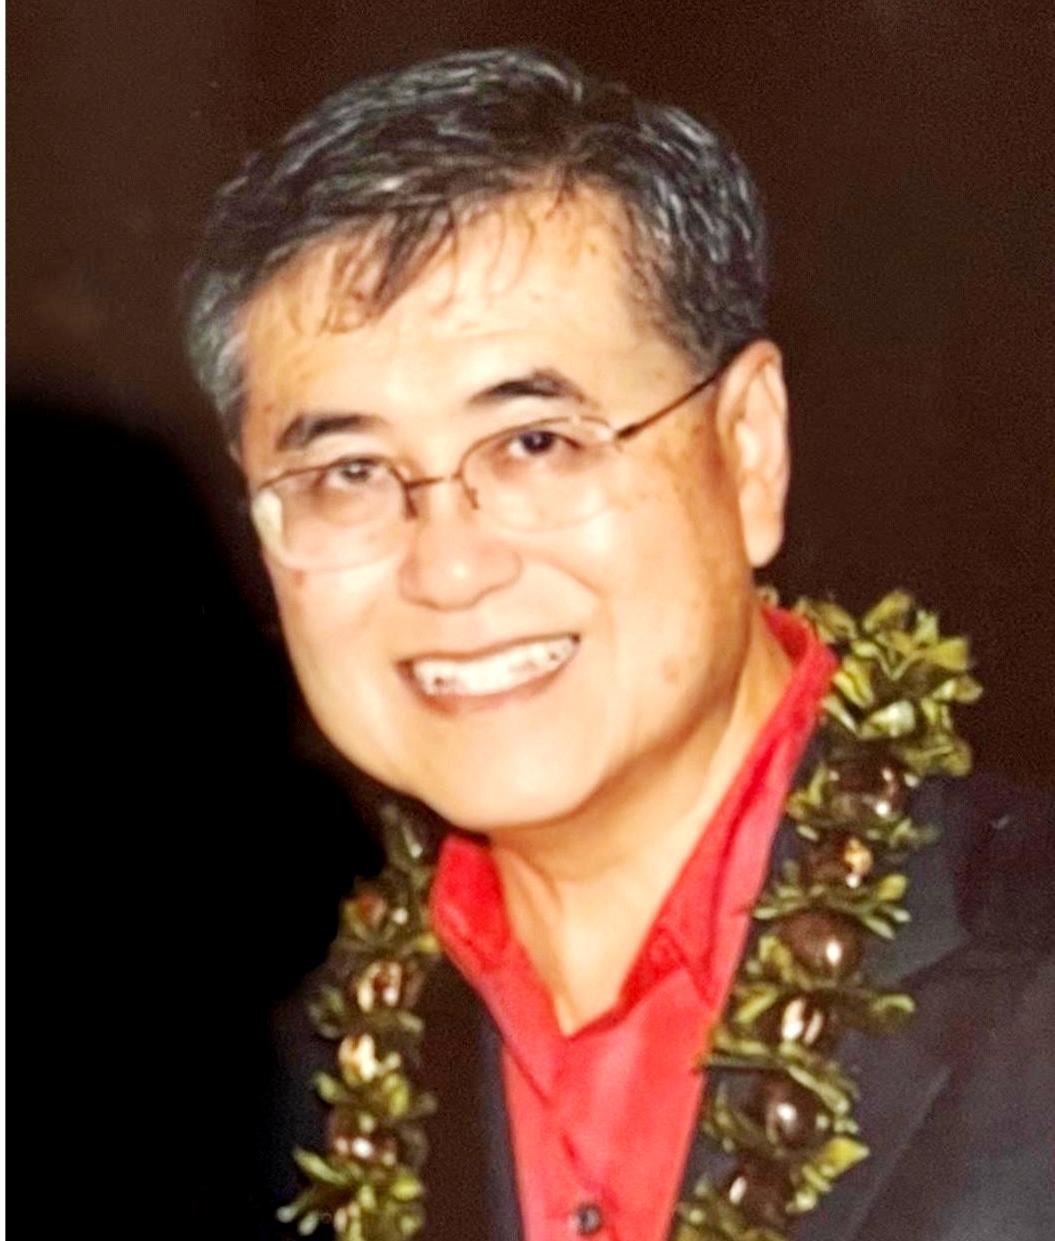 David Chung-Yee Law